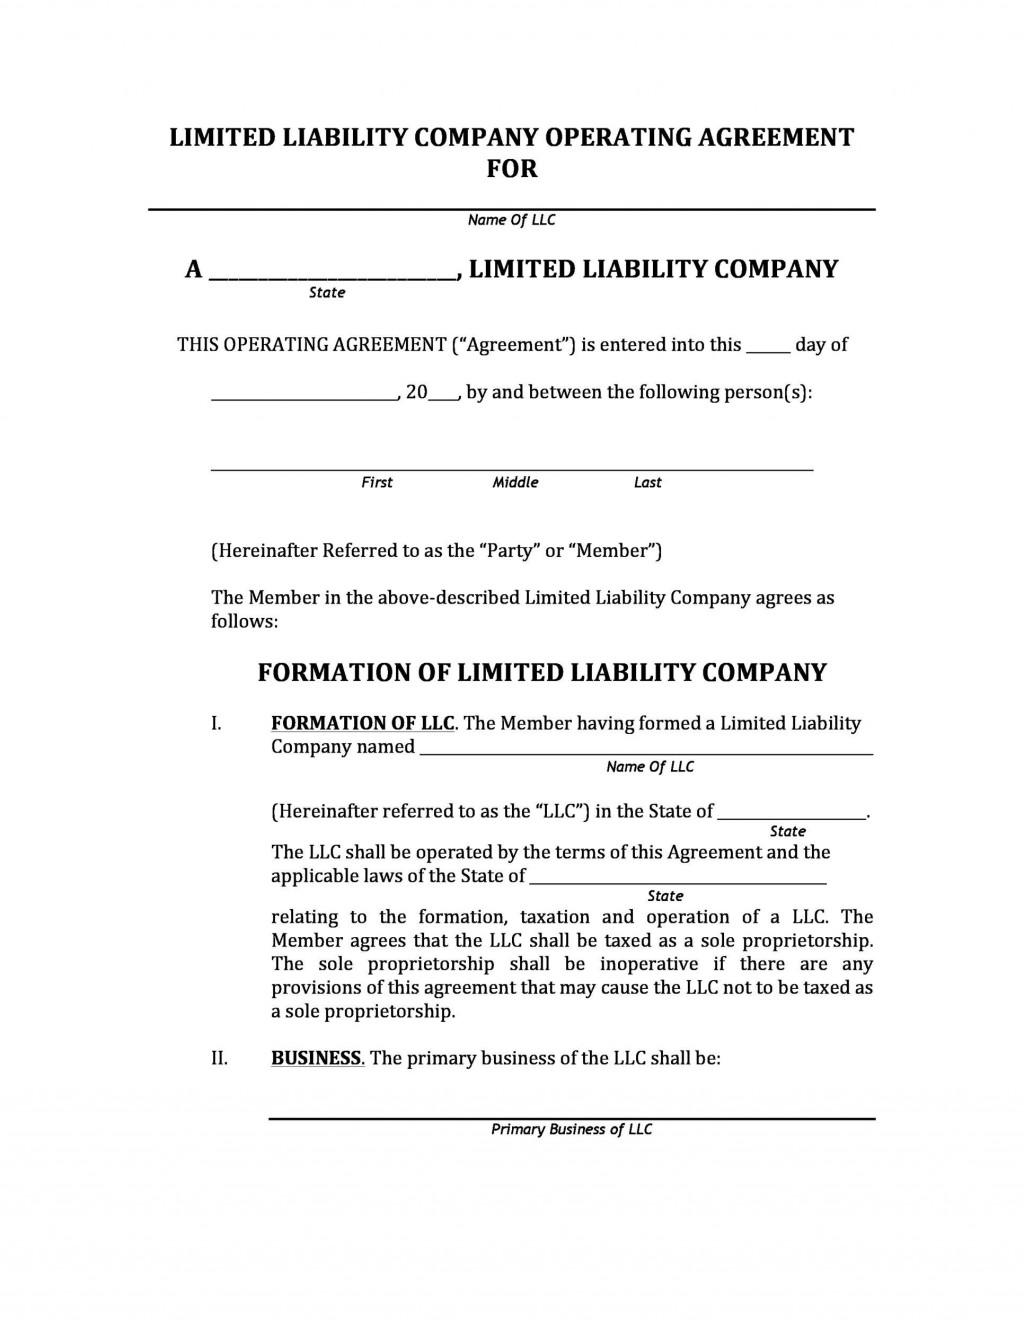 006 Marvelou Llc Partnership Agreement Template Image  Free OperatingLarge